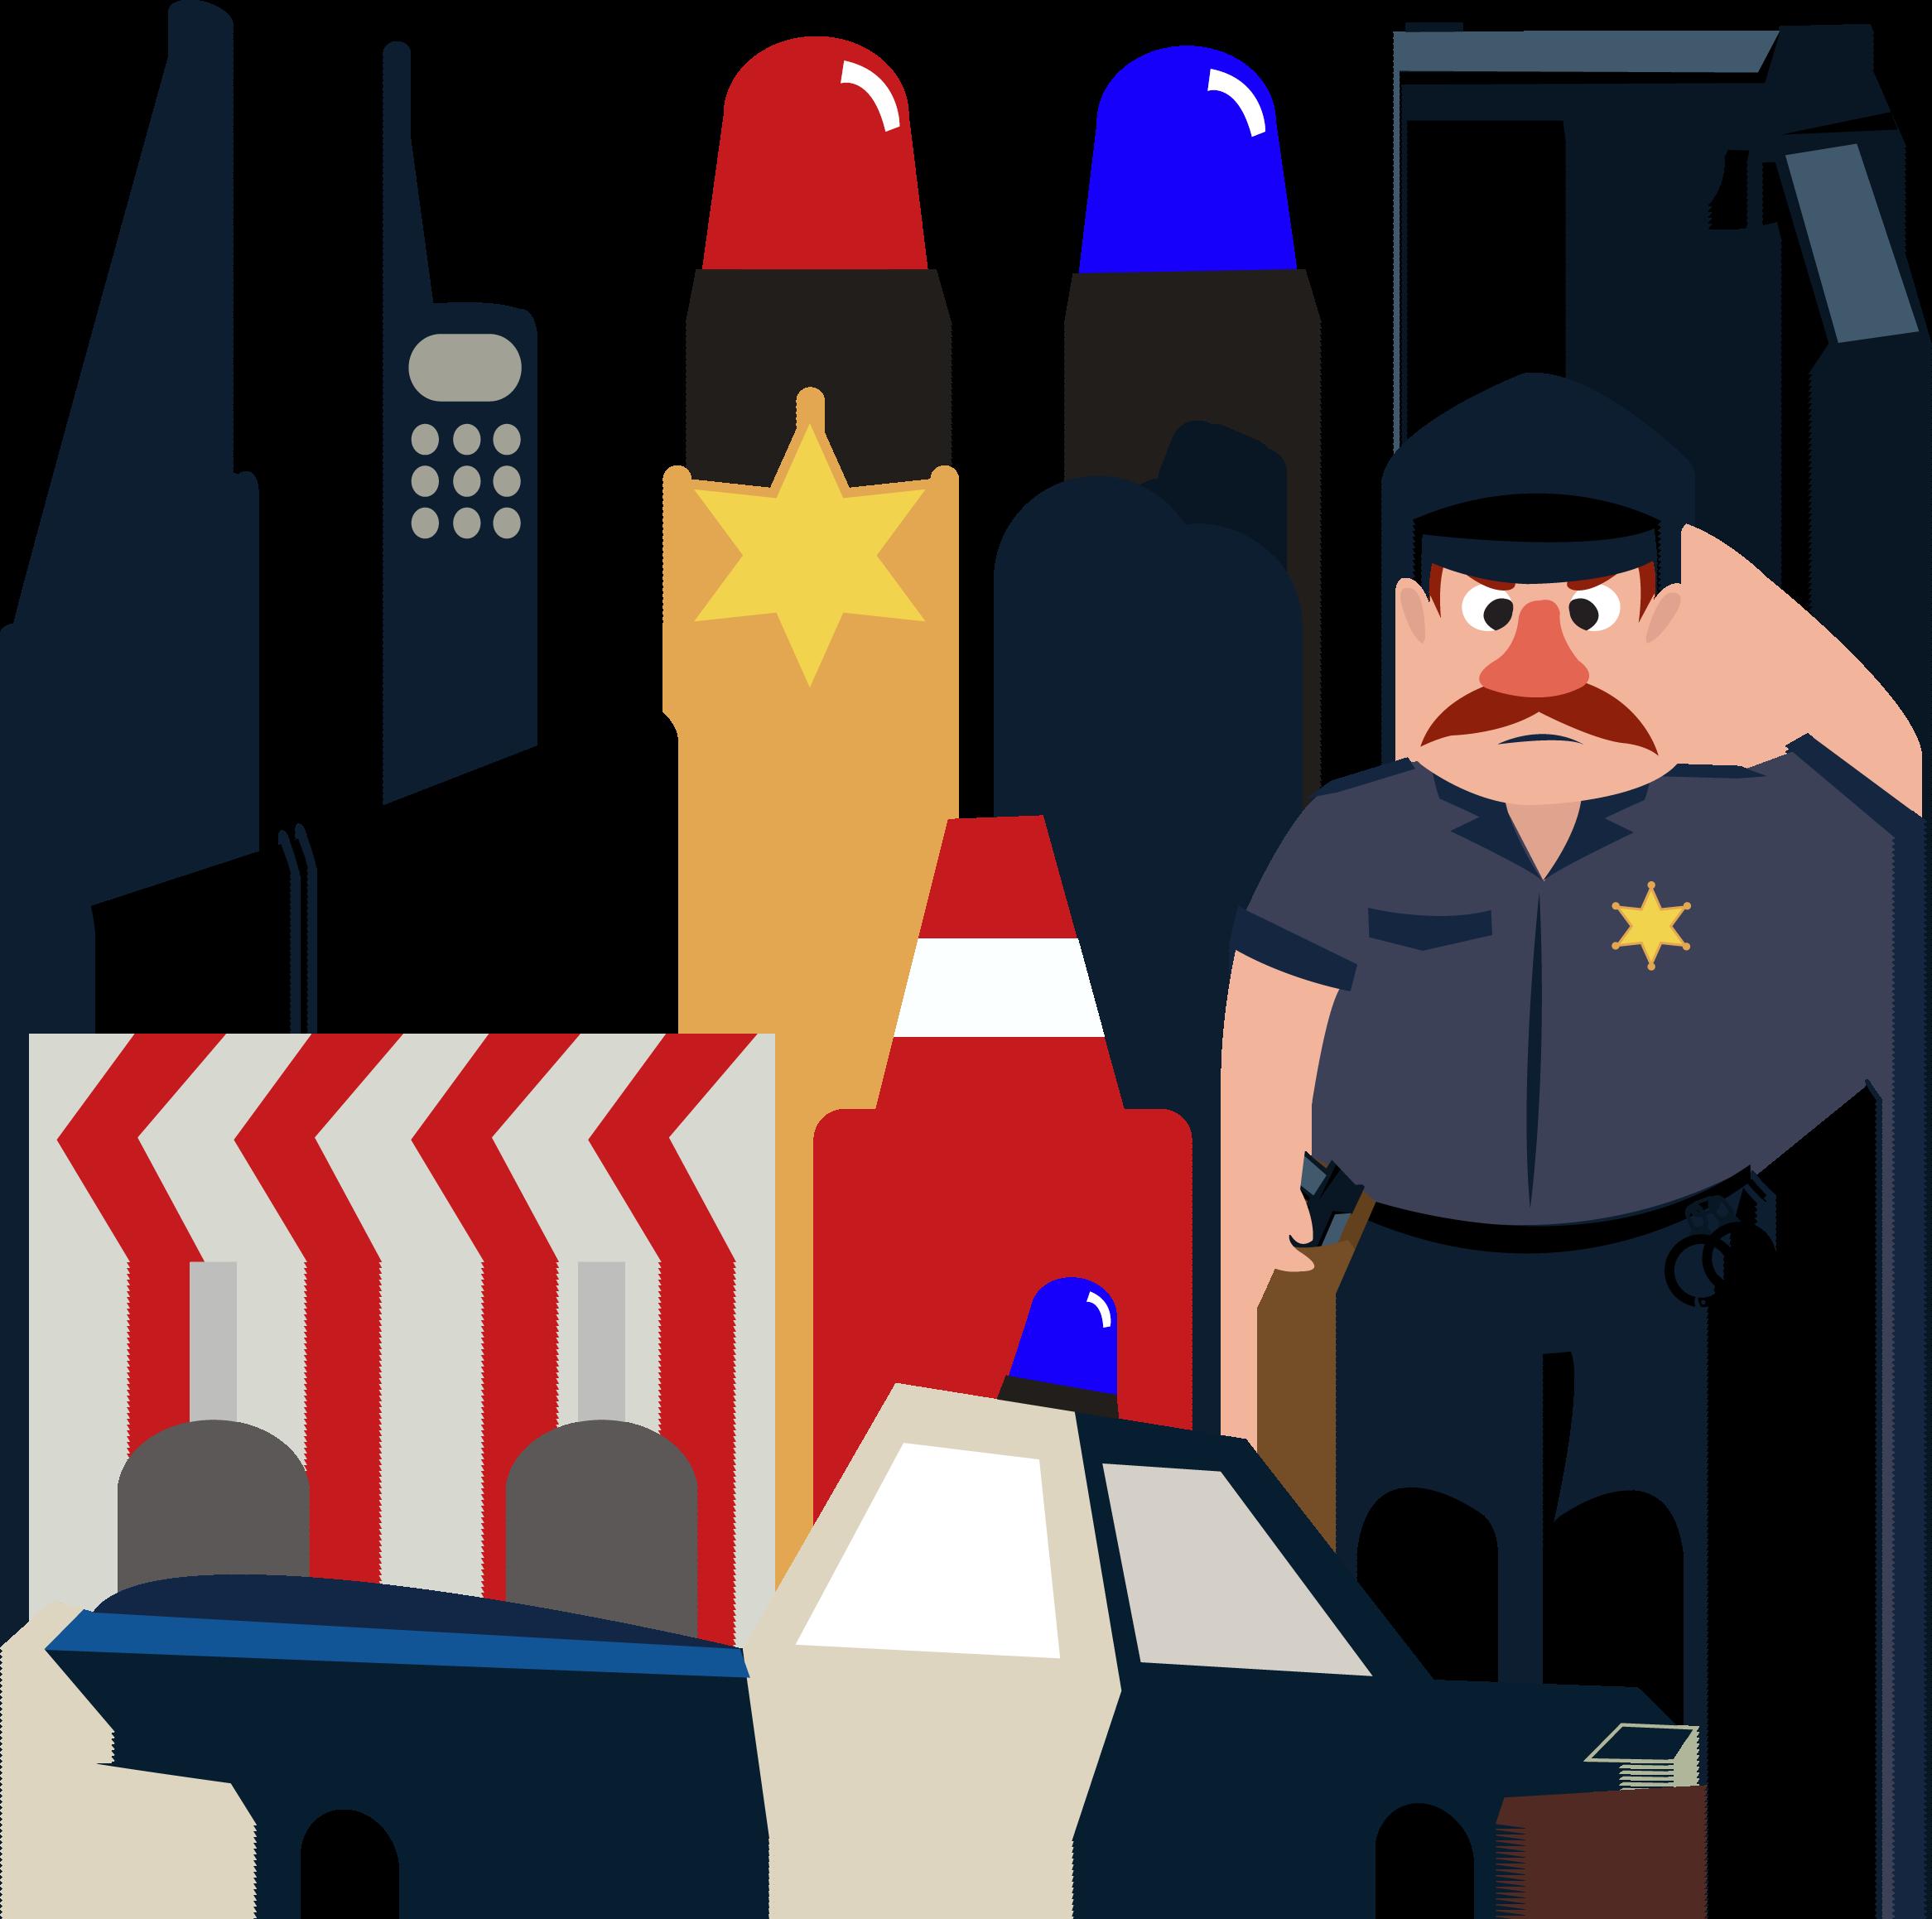 Handcuffs clipart police officer. Cartoon illustration tools